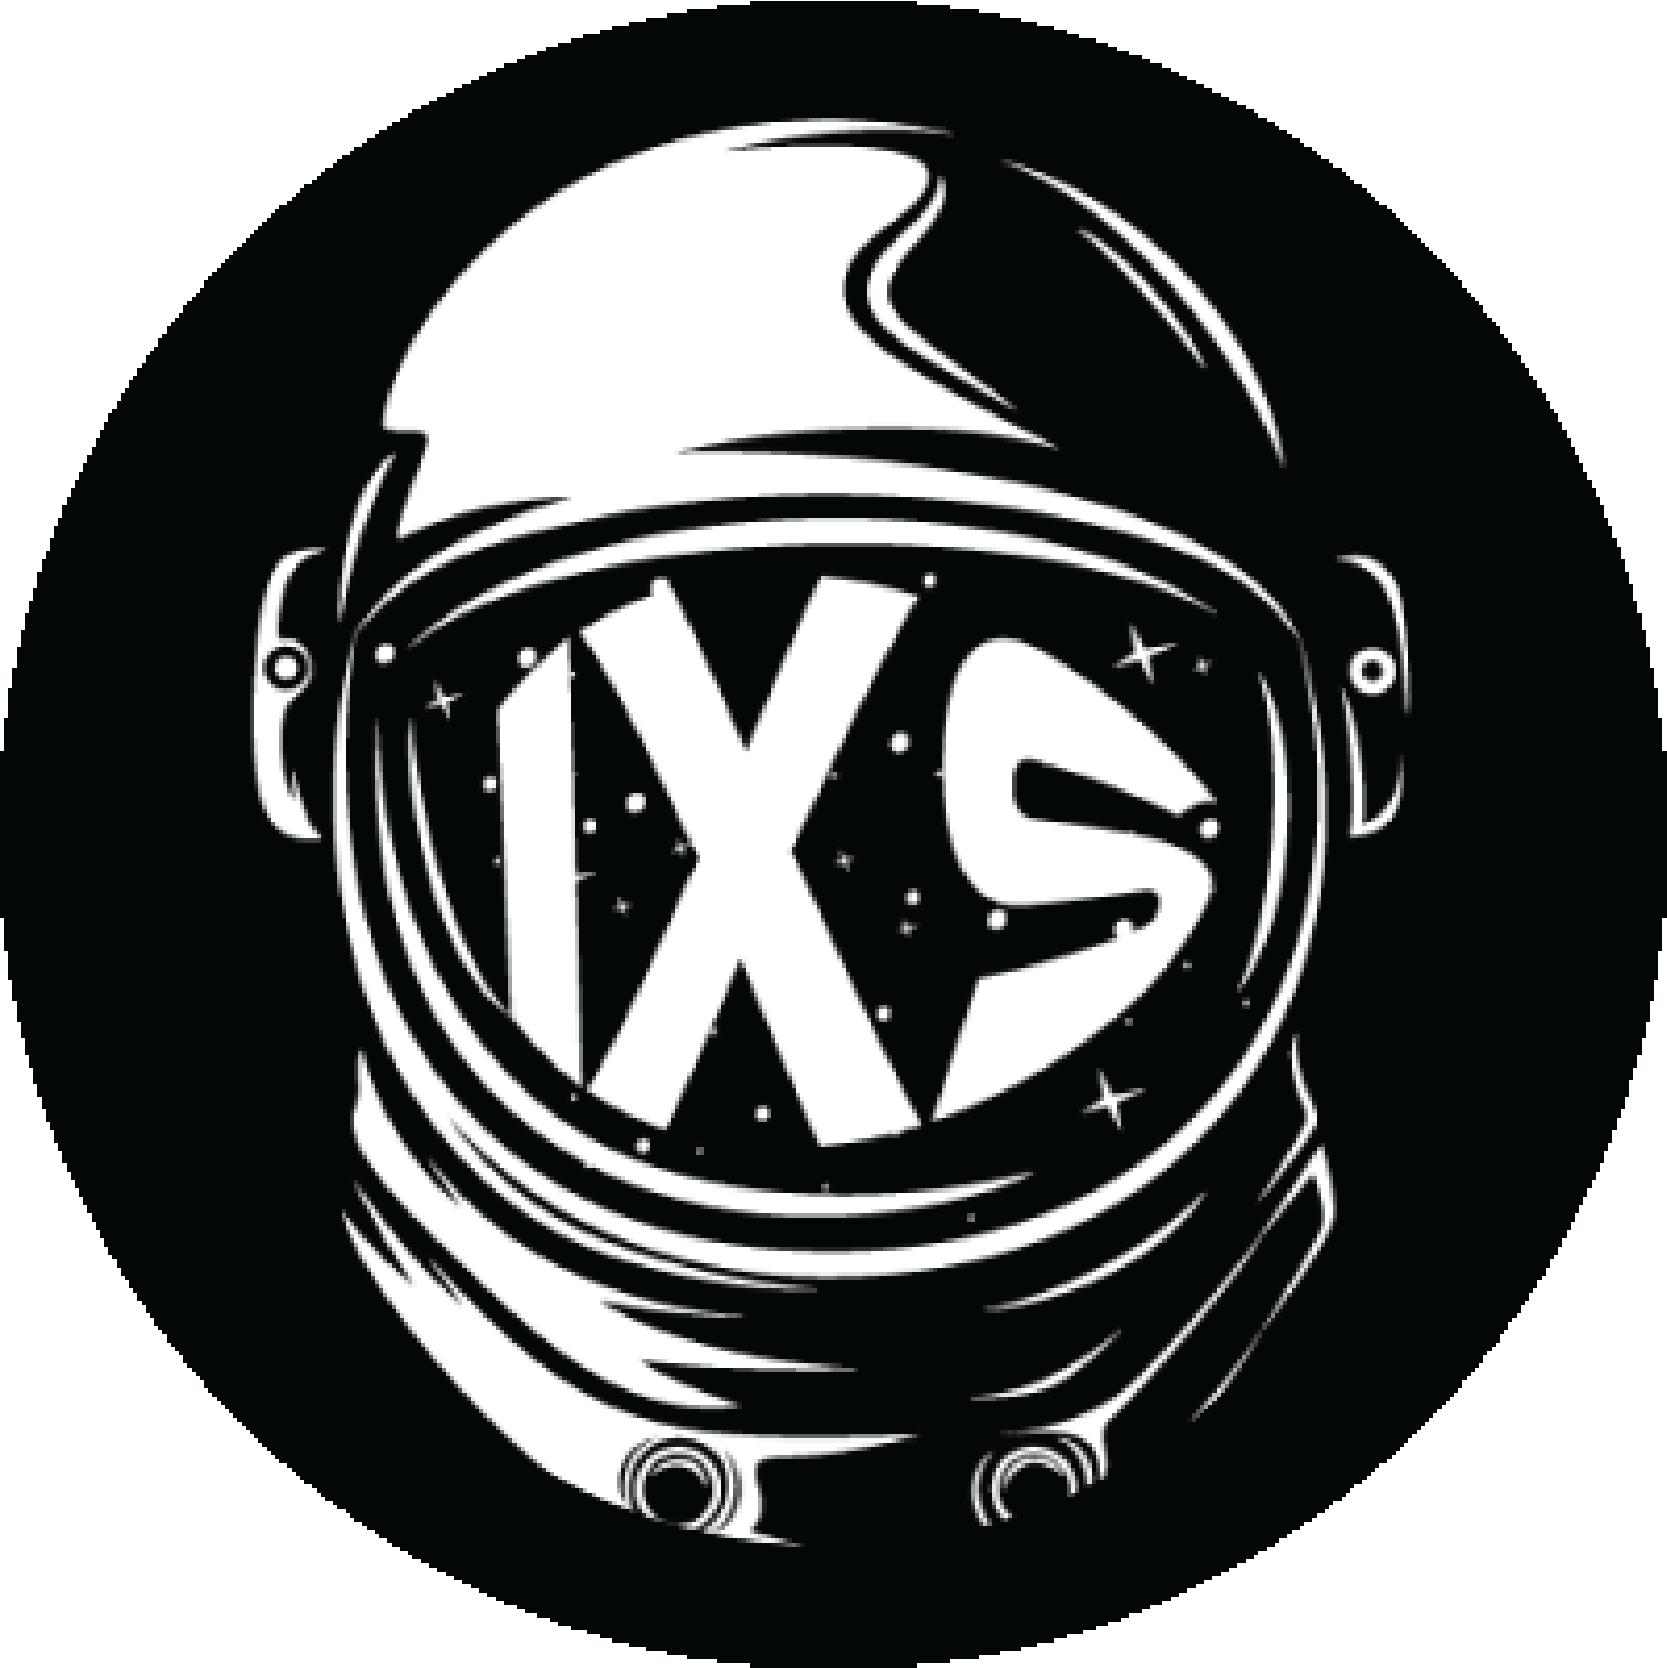 IX Swap IXS icon symbol